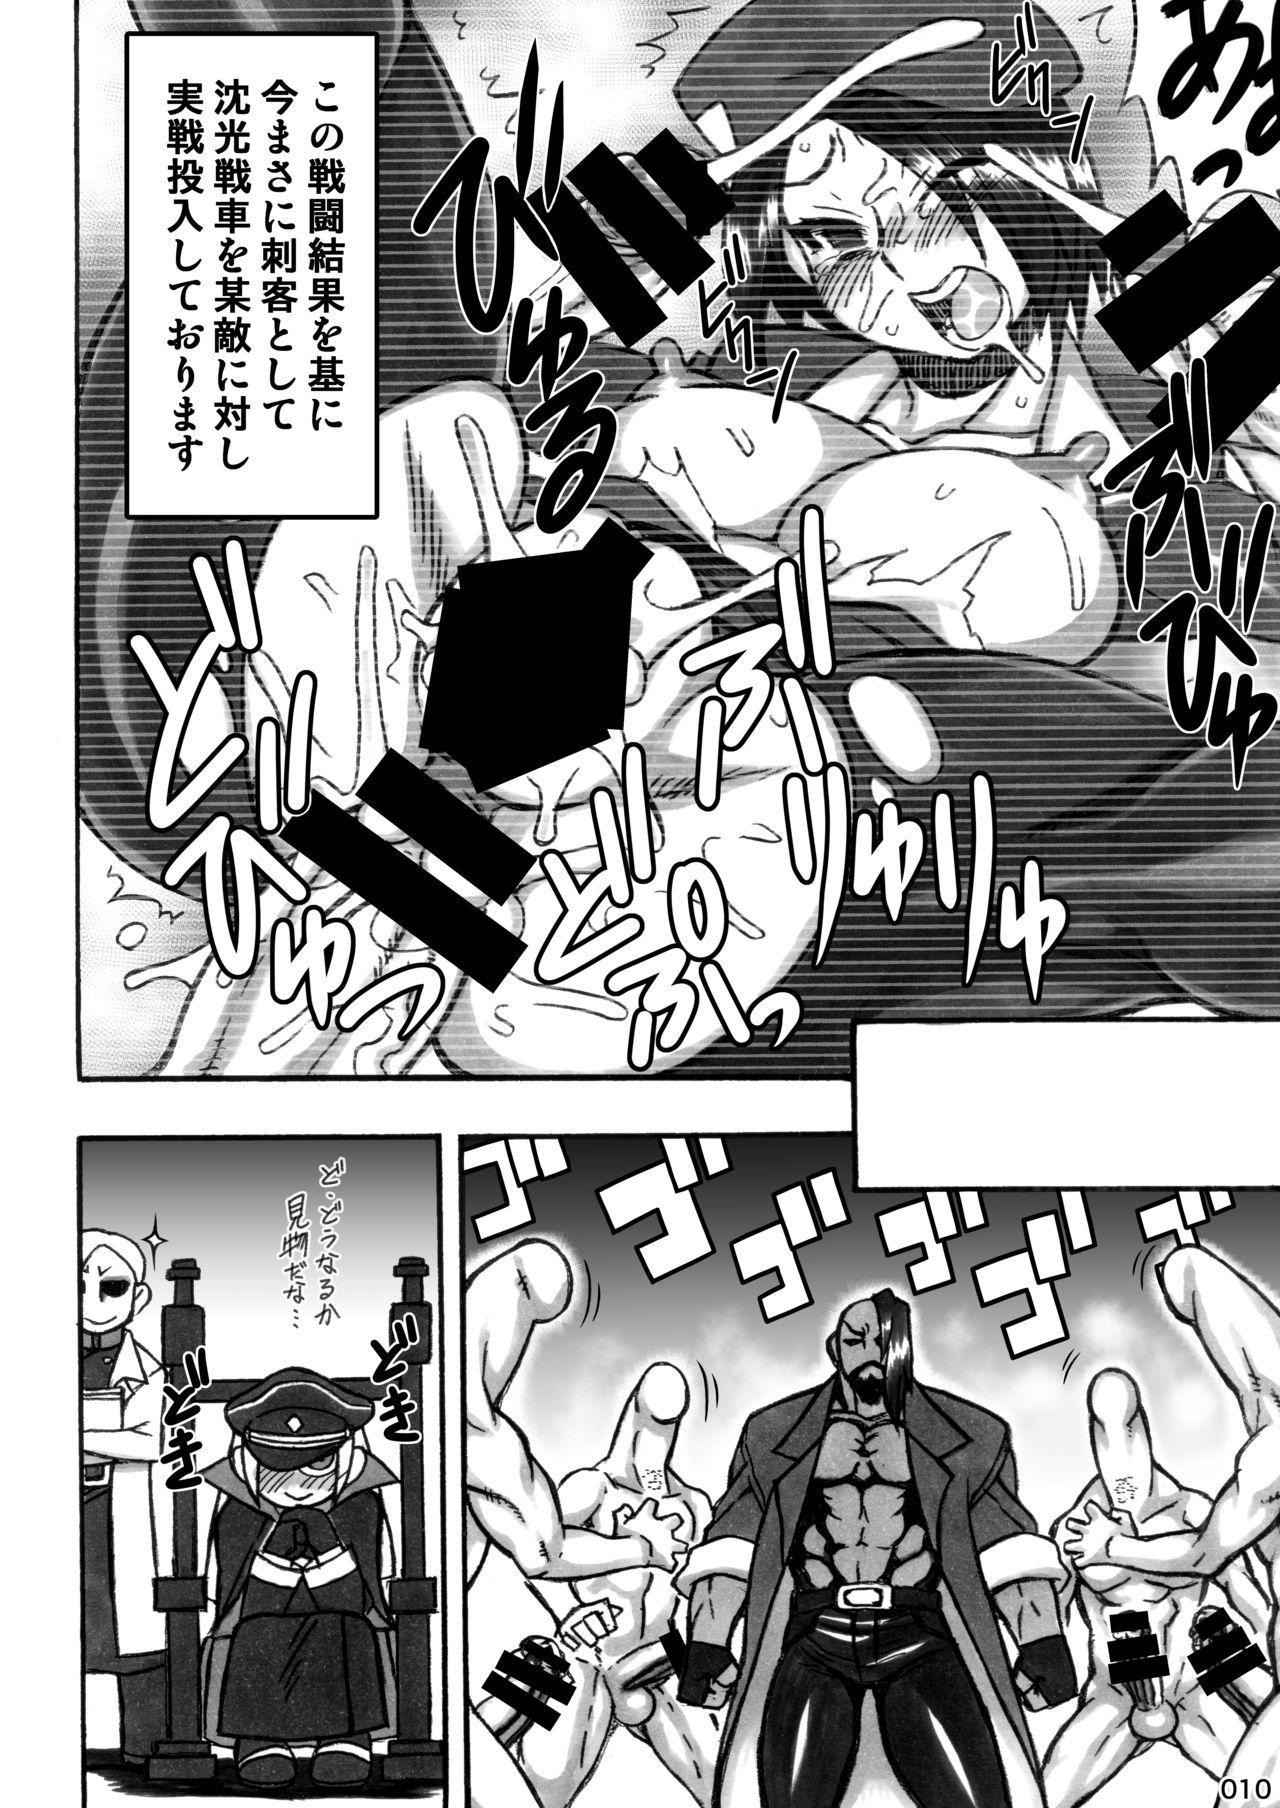 Akatsuki Blitzkampf & EN-1 Perfekt Welt Gangbang Anthology 9